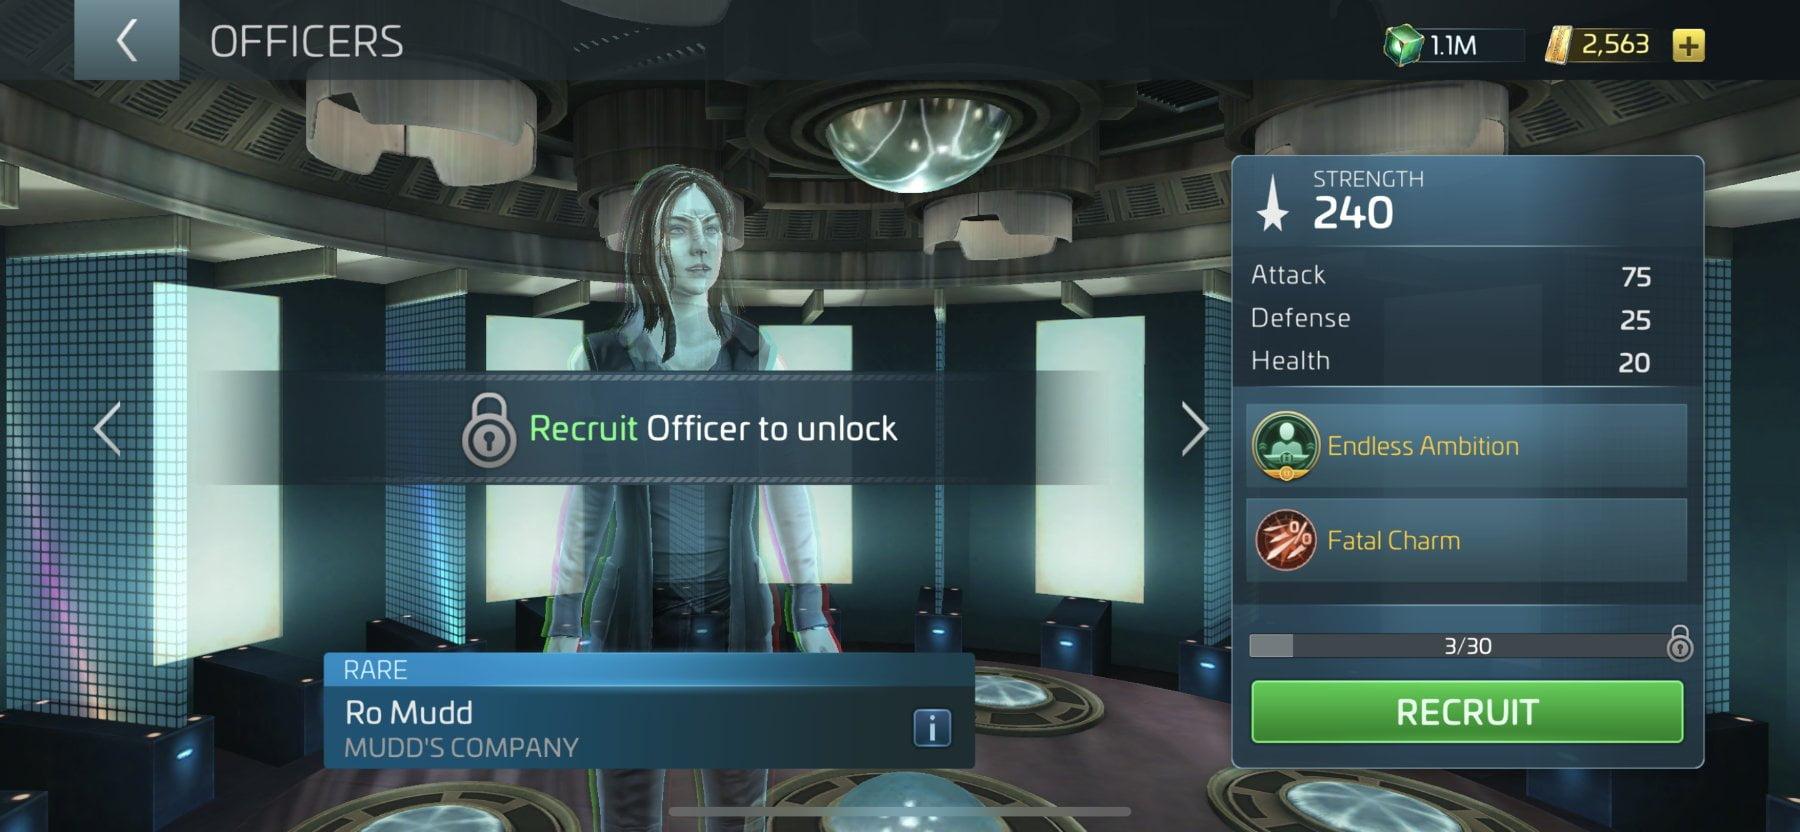 Star Trek Fleet Command Officer Ro Mudd